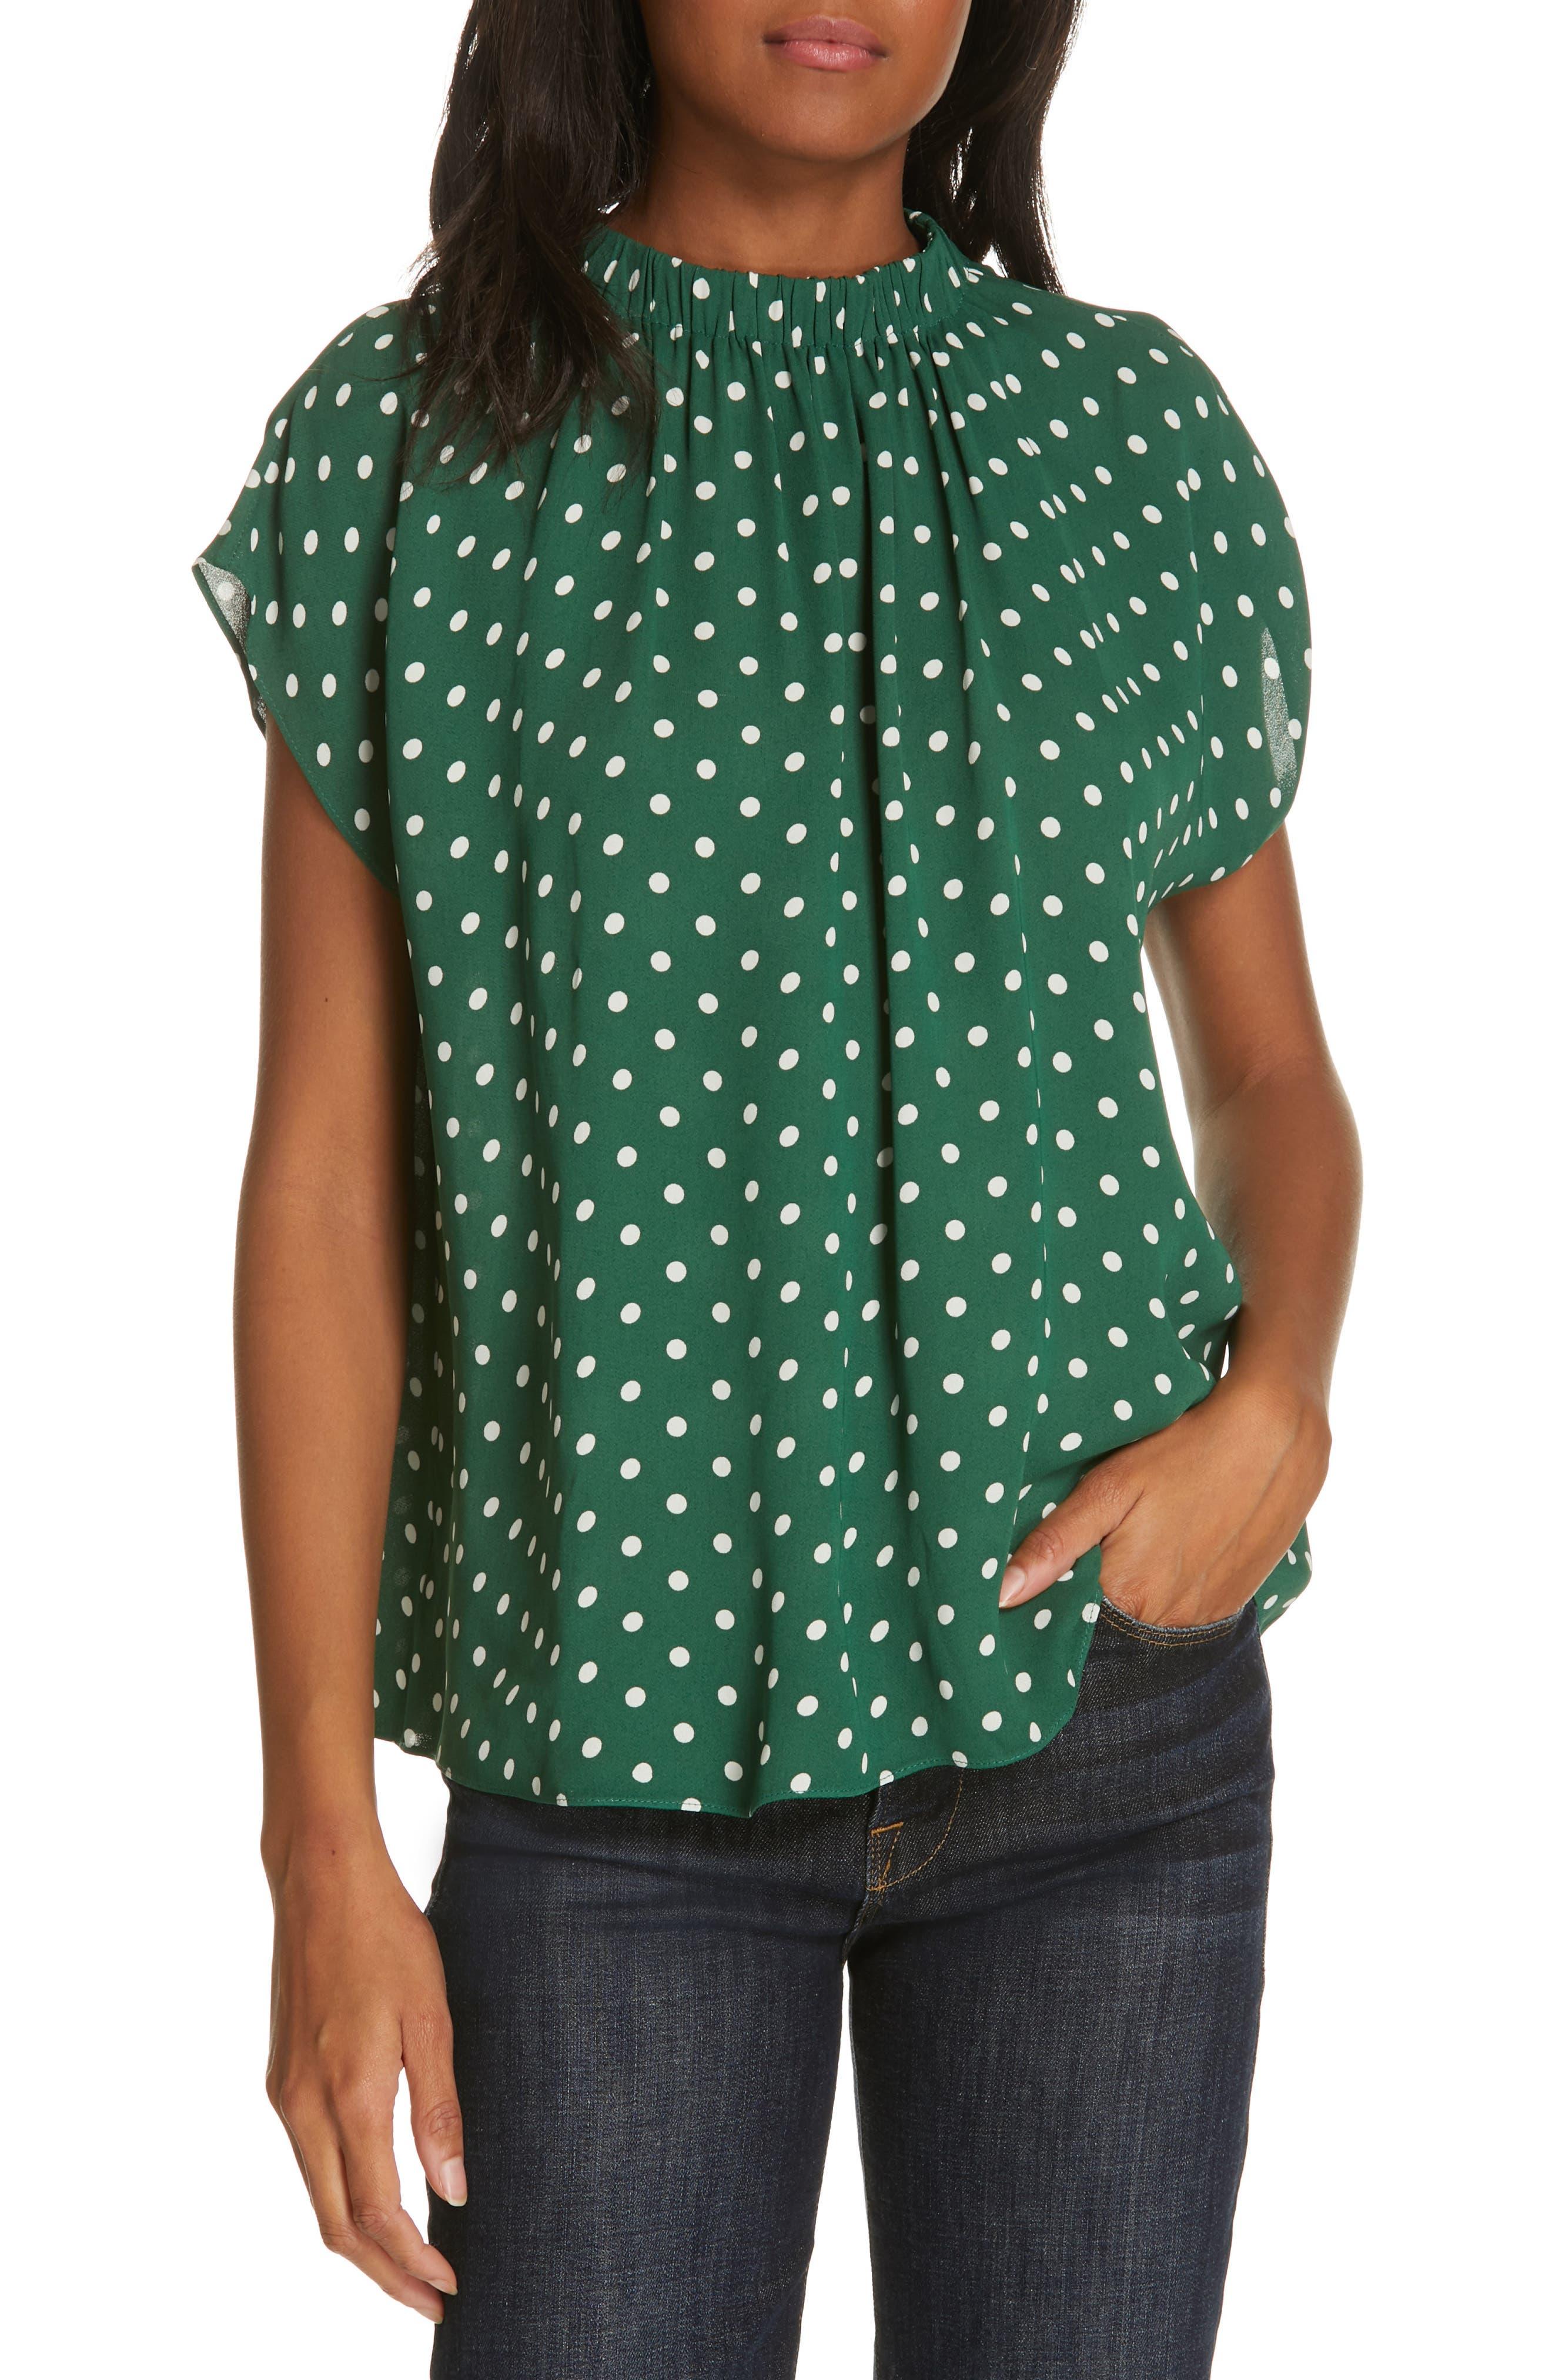 Polka Dot Short Sleeve Top, Main, color, GREEN EDEN PETITE DOT